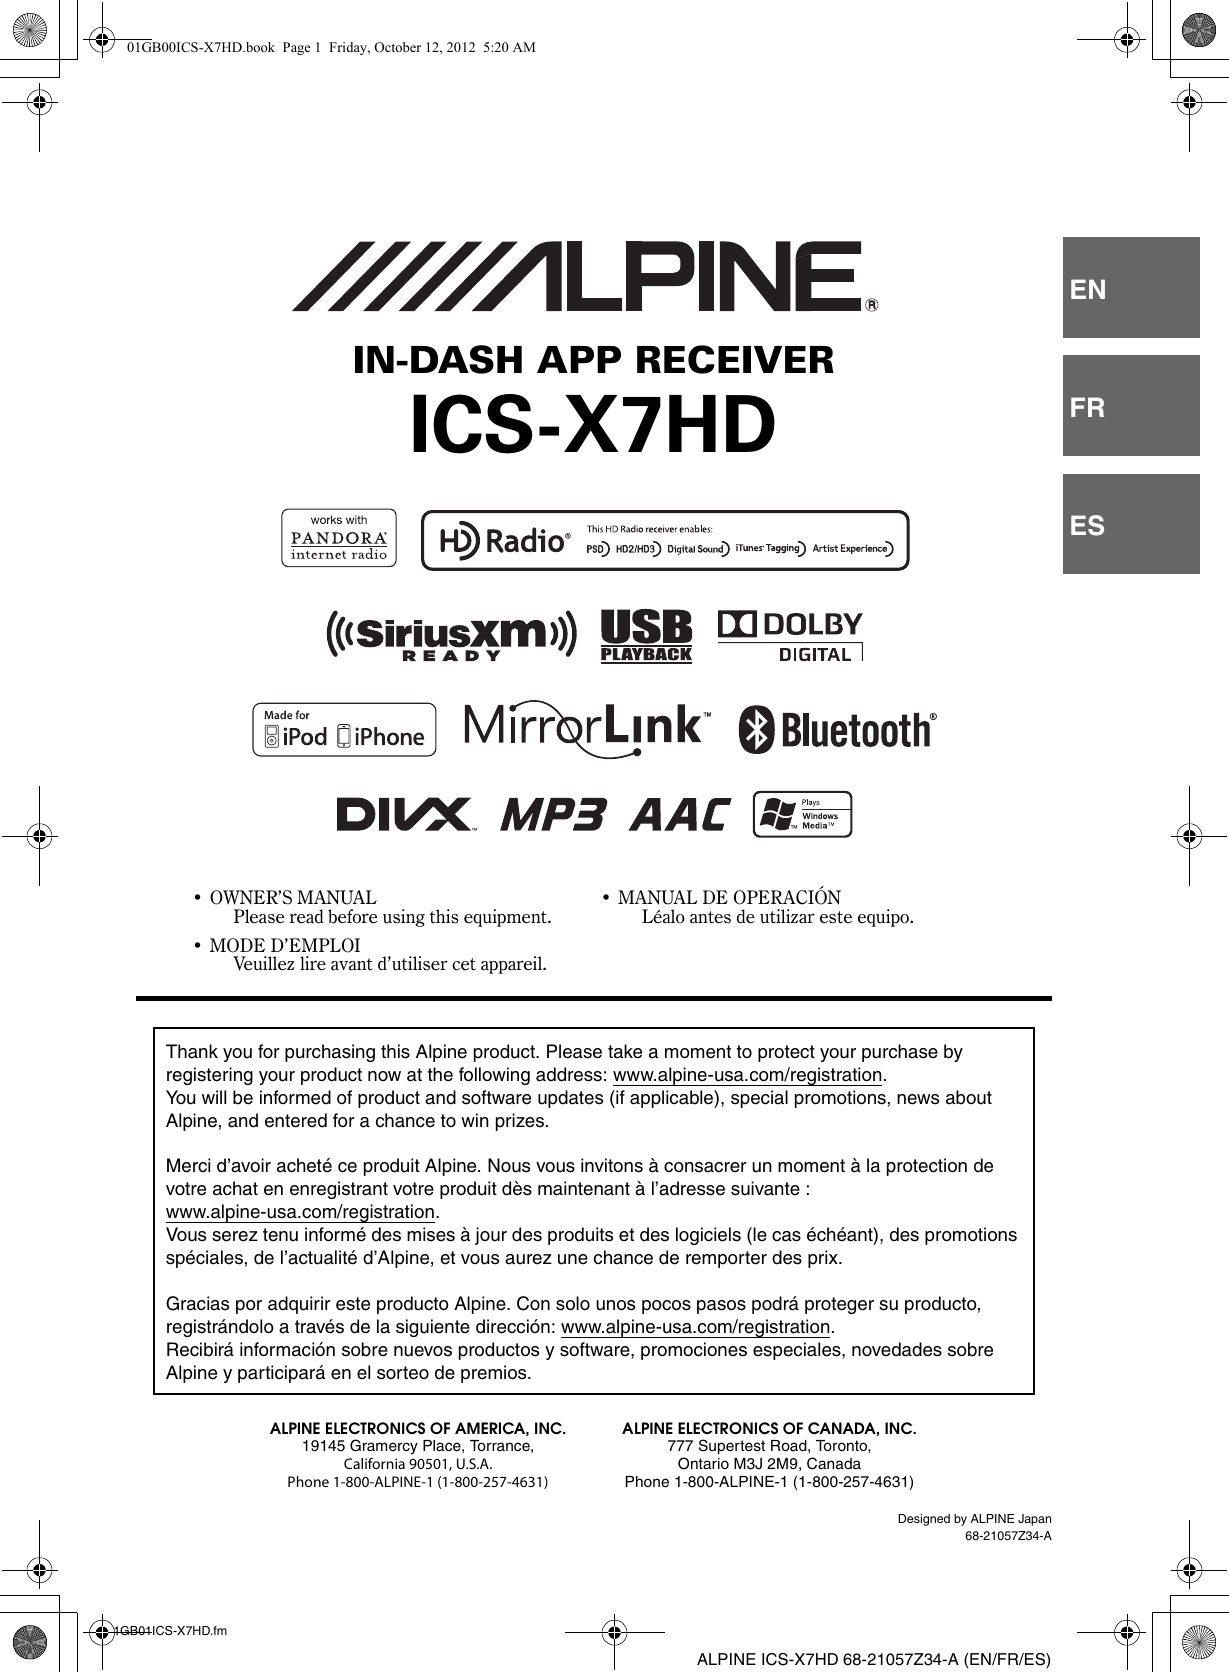 Alpine Ics X7Hd Owners Manual 68 21057Z34 A on